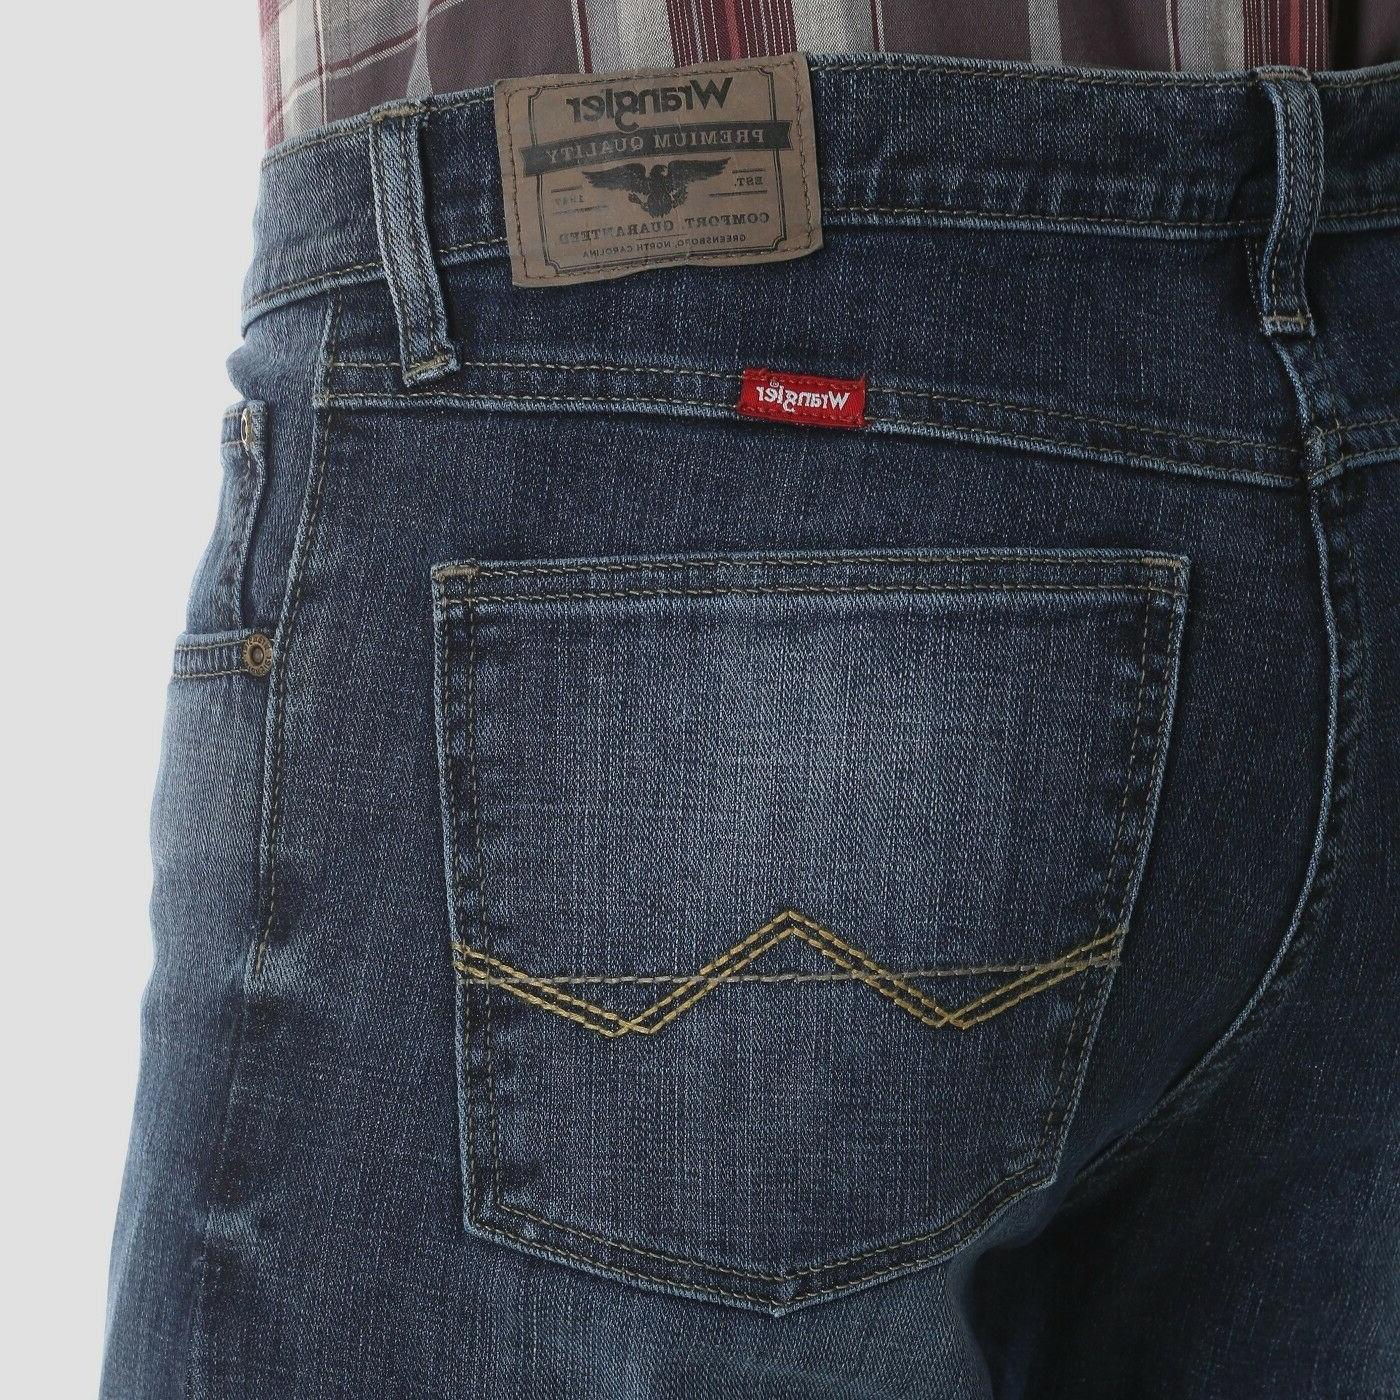 Wrangler Men's 5 Pants with